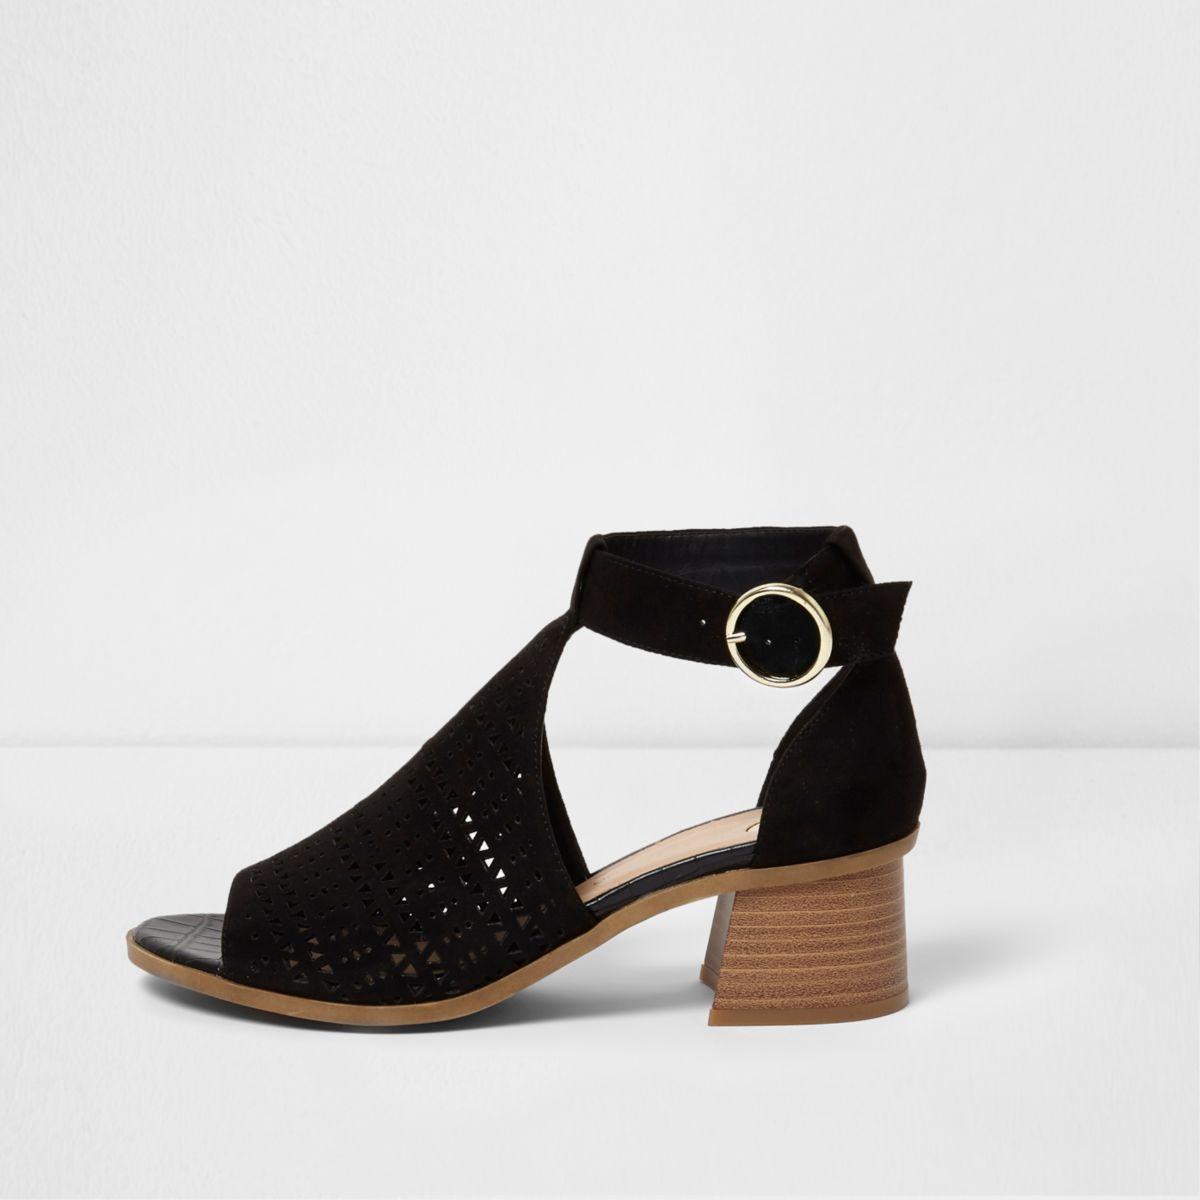 Black laser cut flared block heel sandals